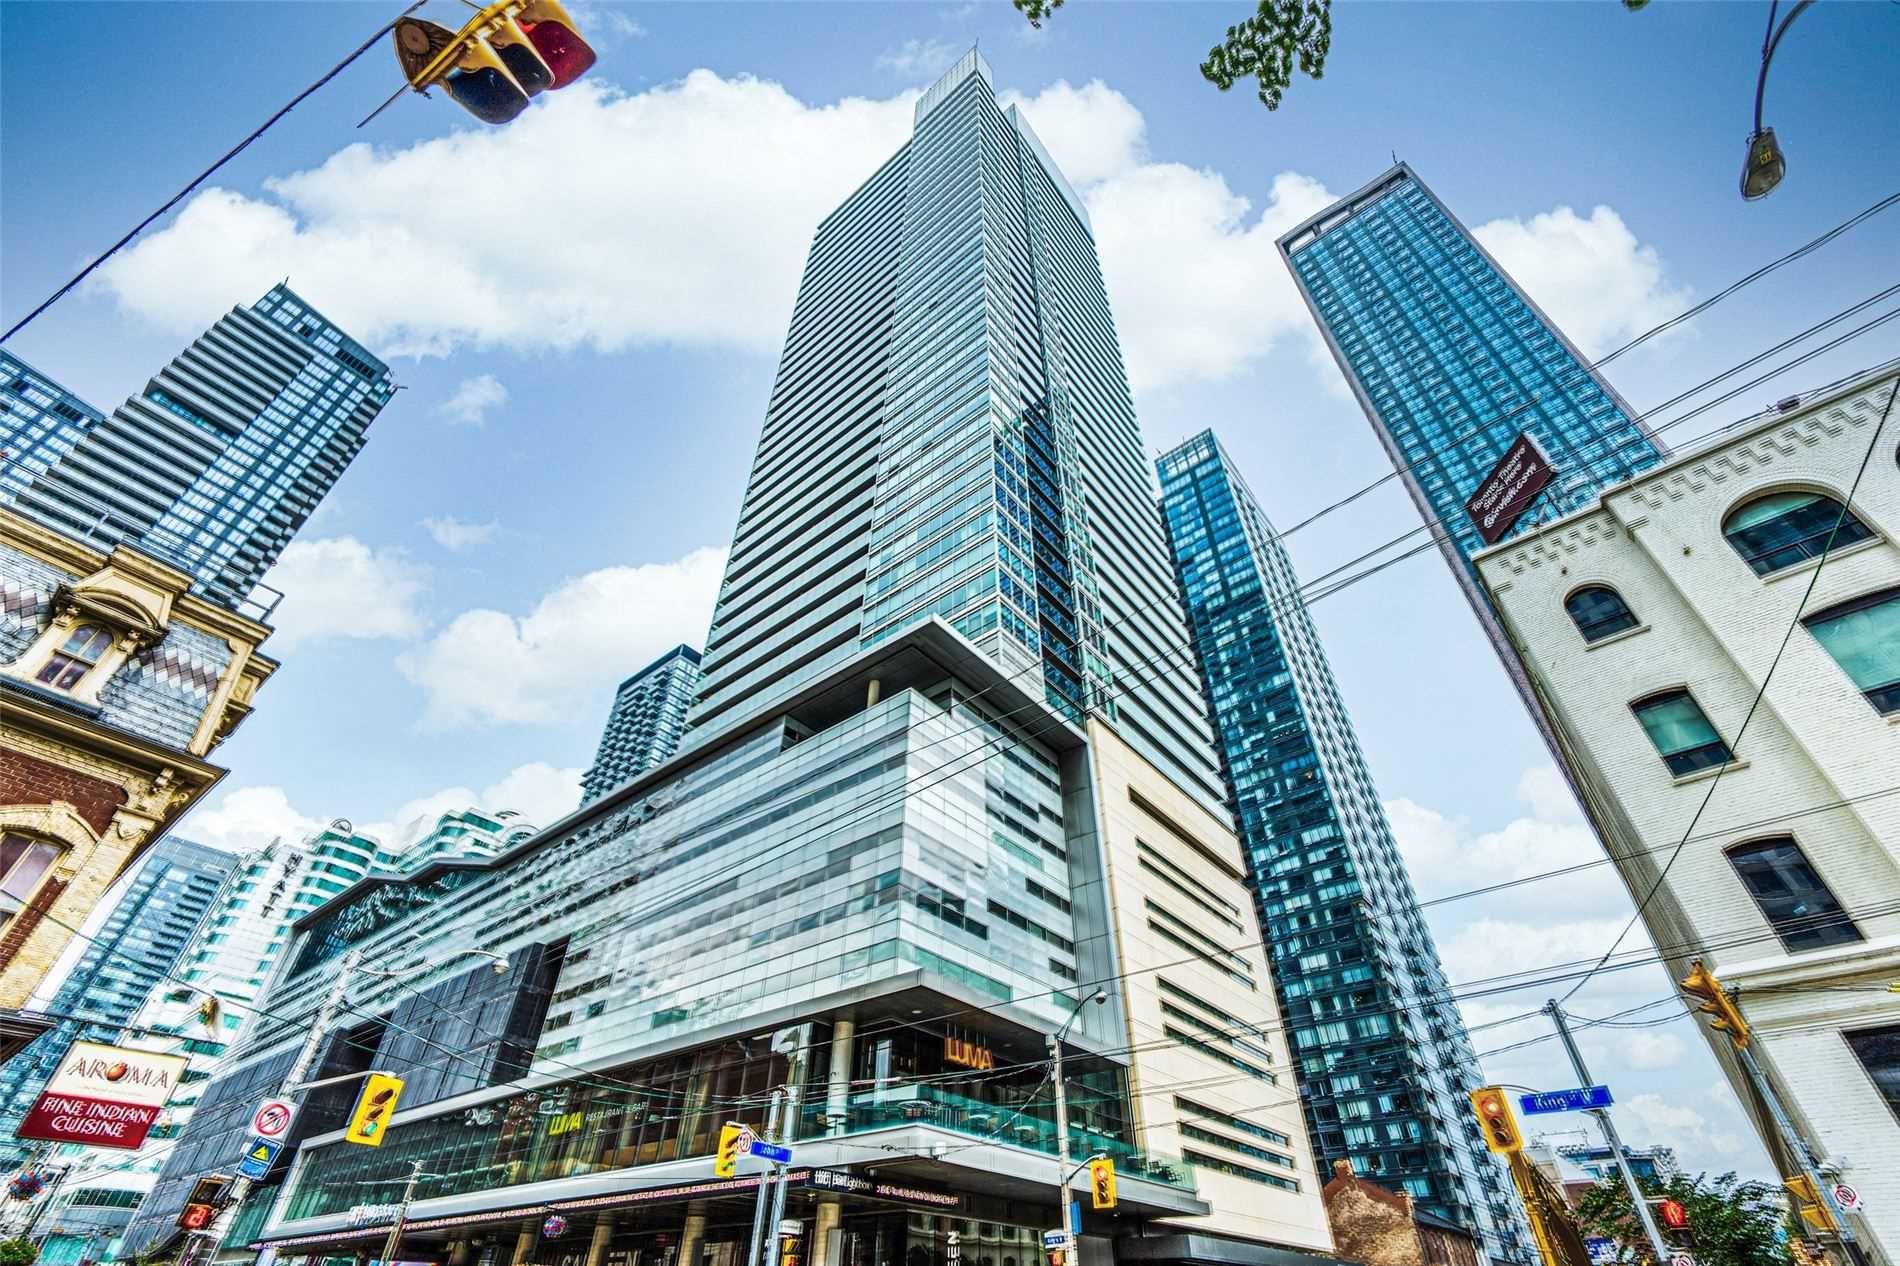 Main Photo: 2008 80 John Street in Toronto: Waterfront Communities C1 Condo for lease (Toronto C01)  : MLS®# C5333369